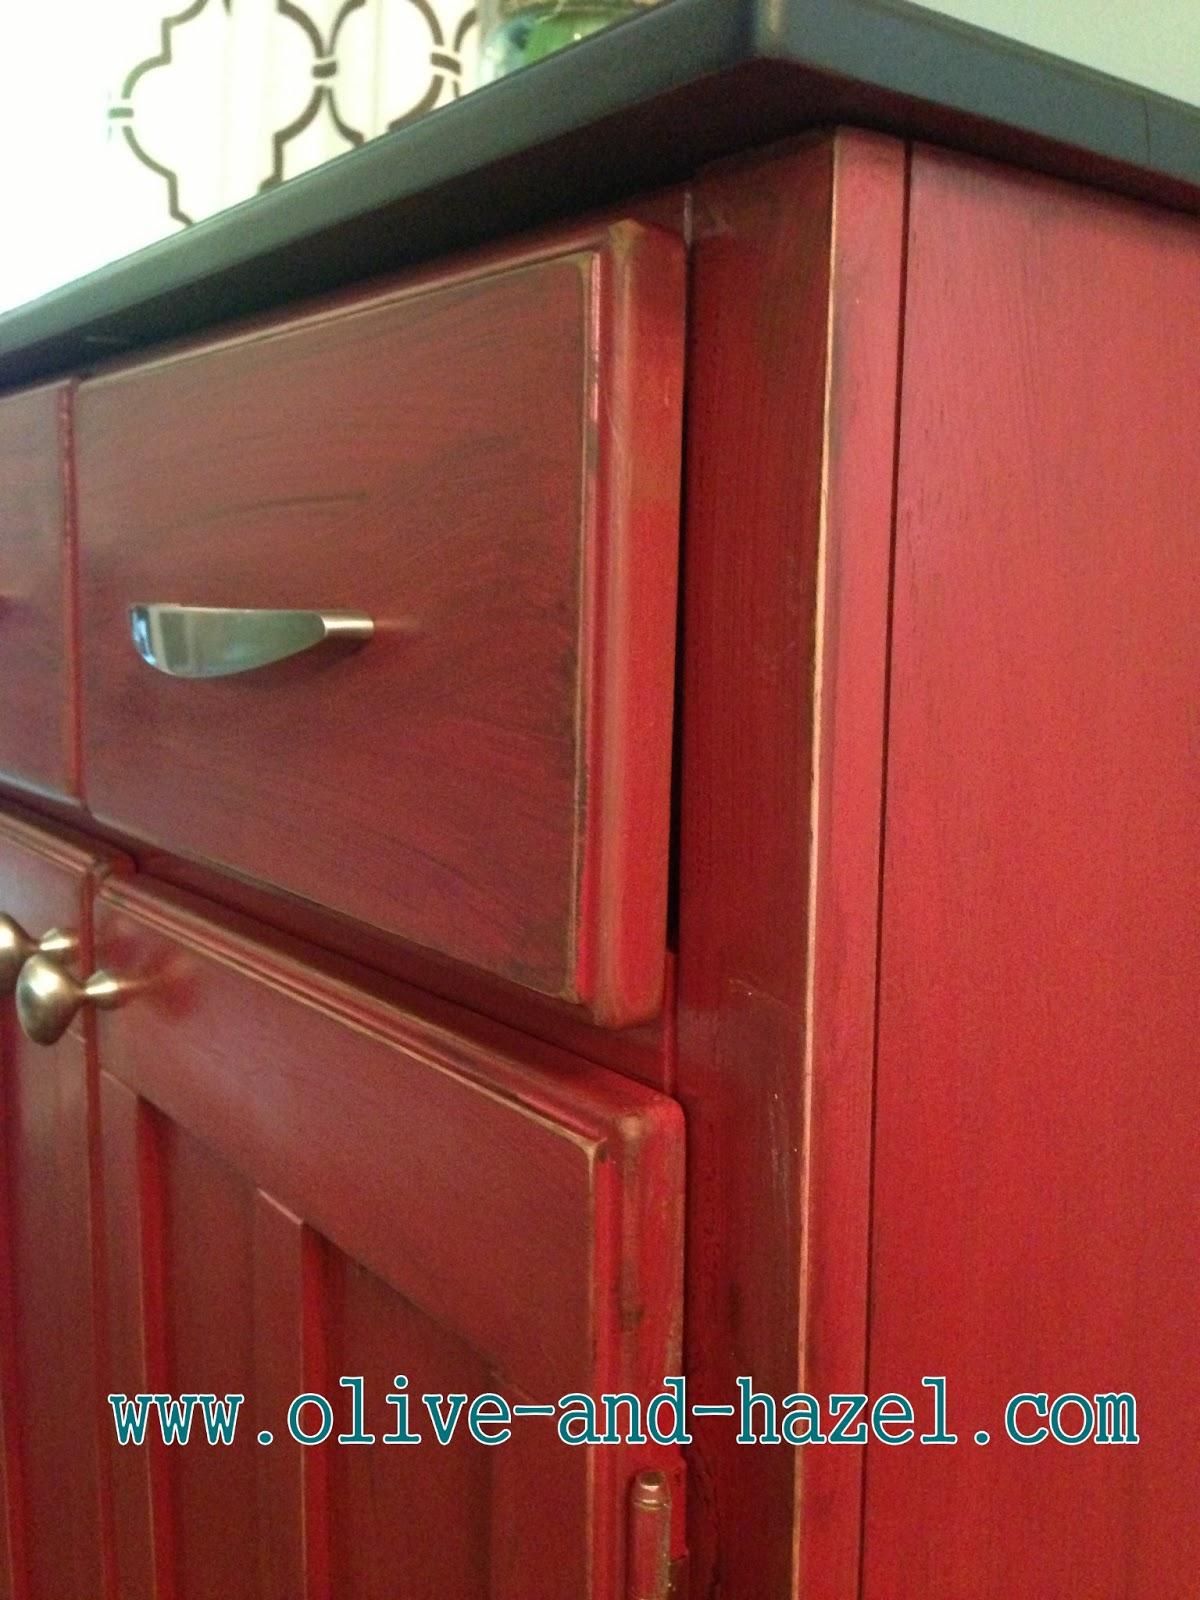 olive  hazel decor co Adorable Red Distressed Storage